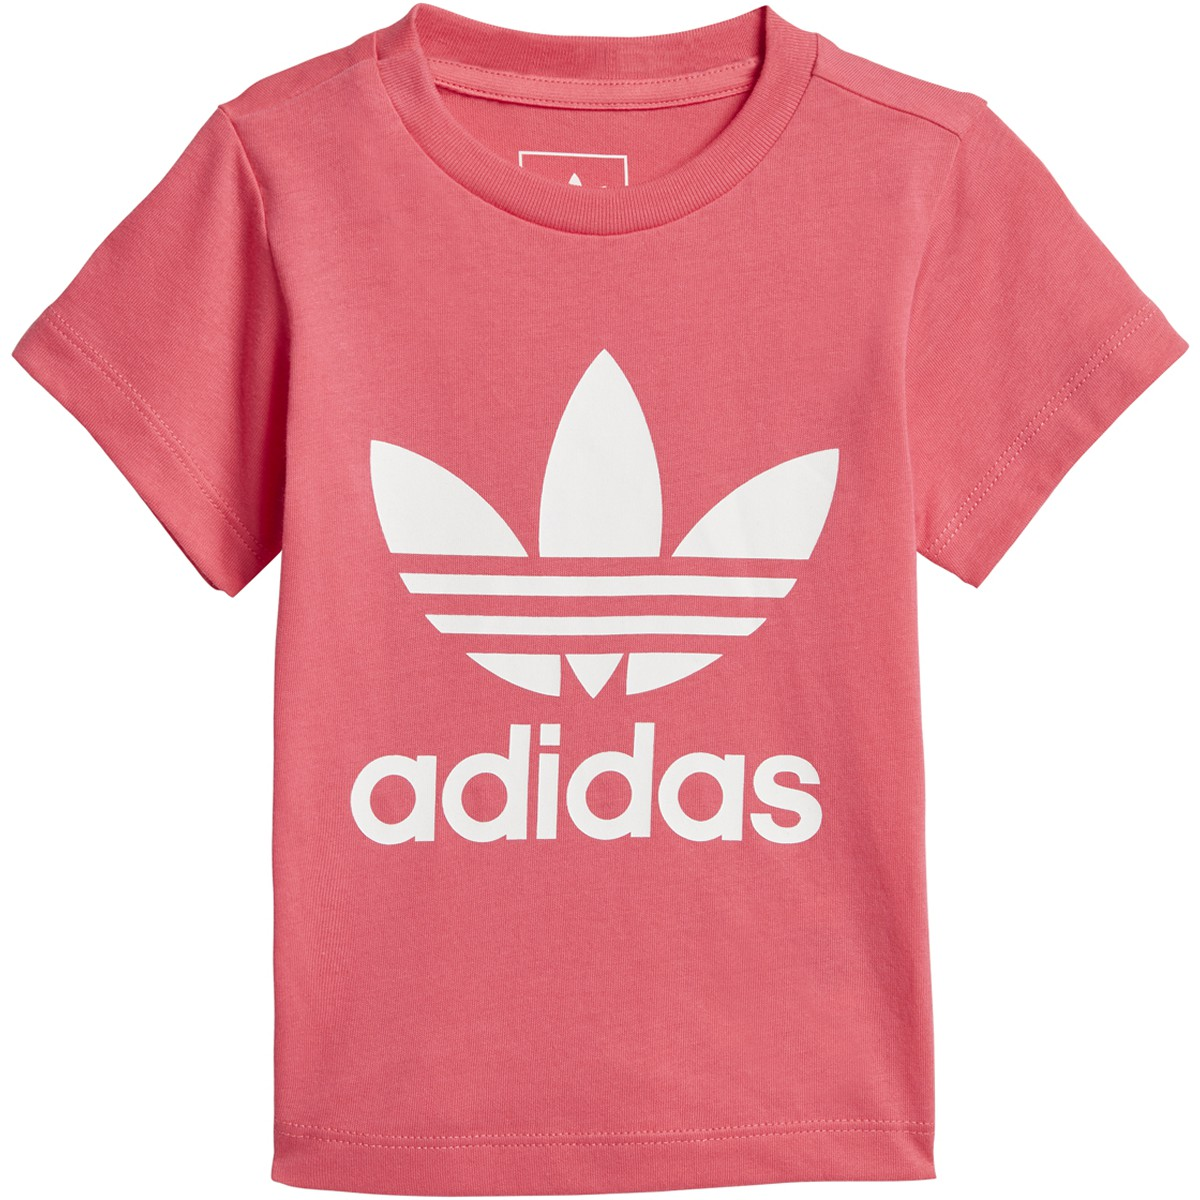 Adidas Originals Baby Girls Trefoil Tee Real Pink-White CE4317   eBay